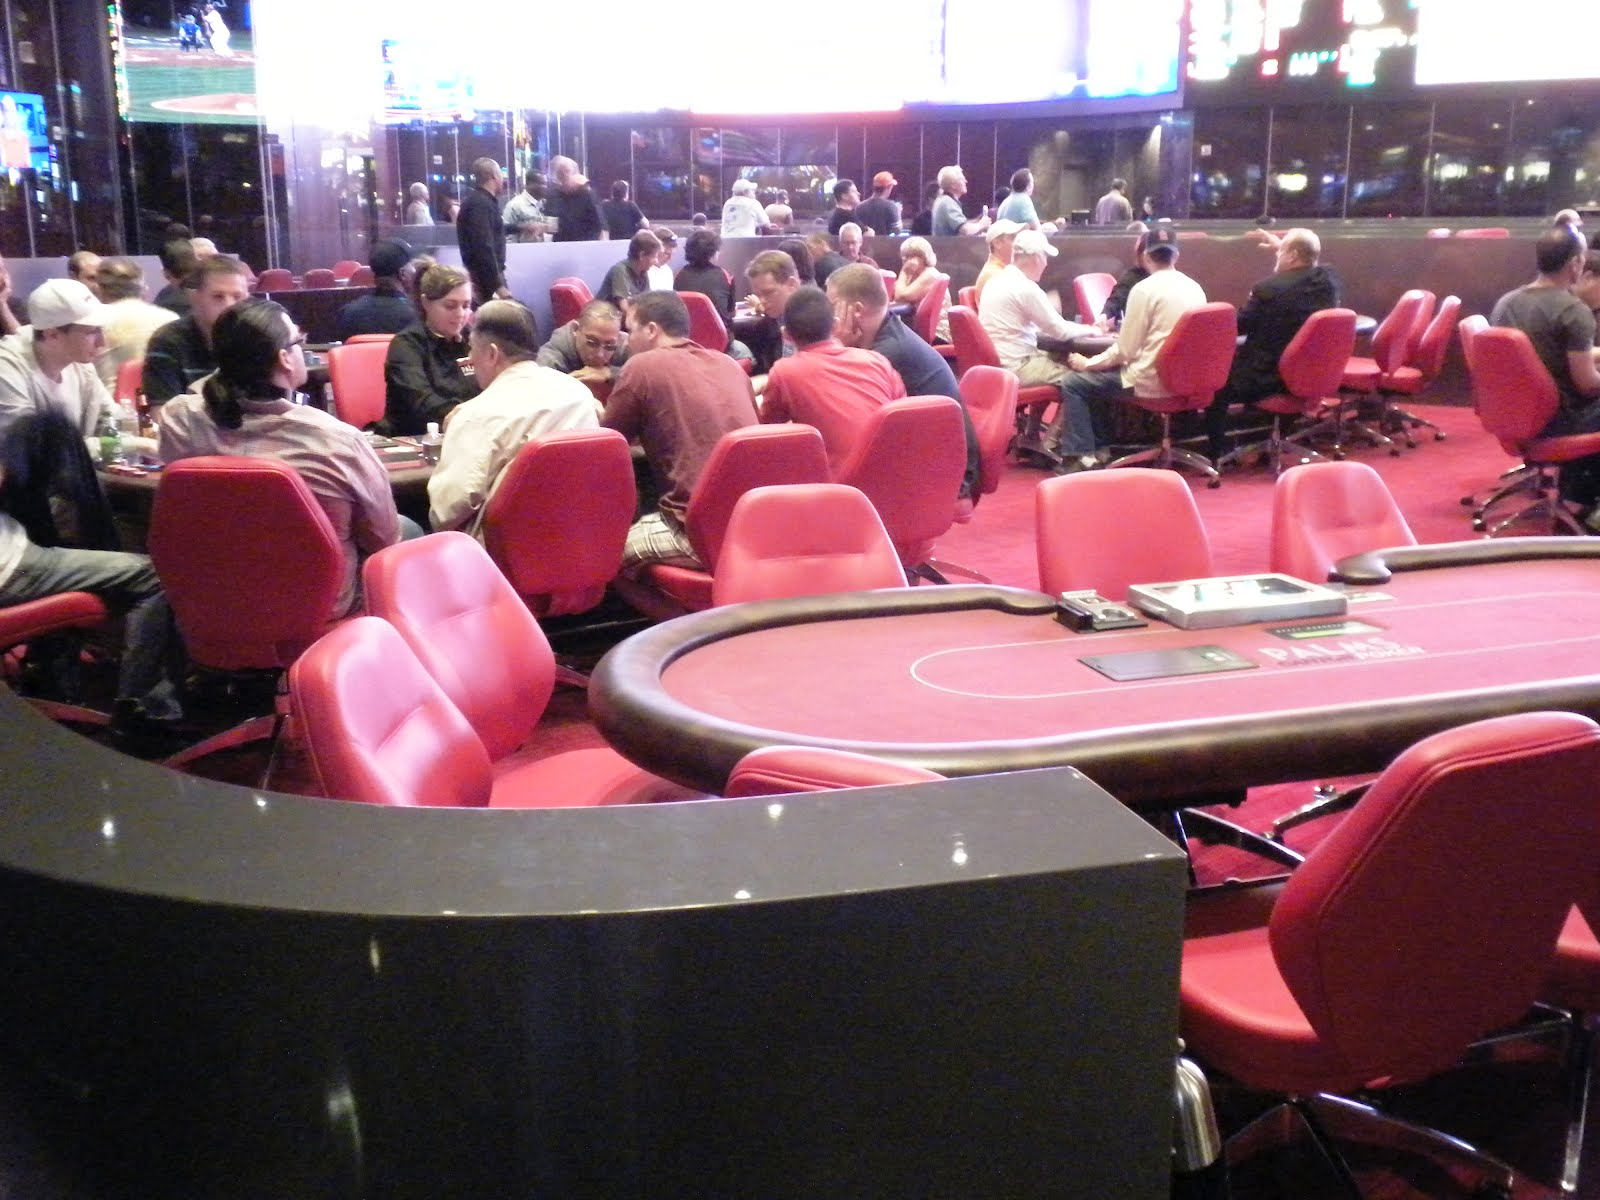 Sandia casino poker tournaments erie casino jobs